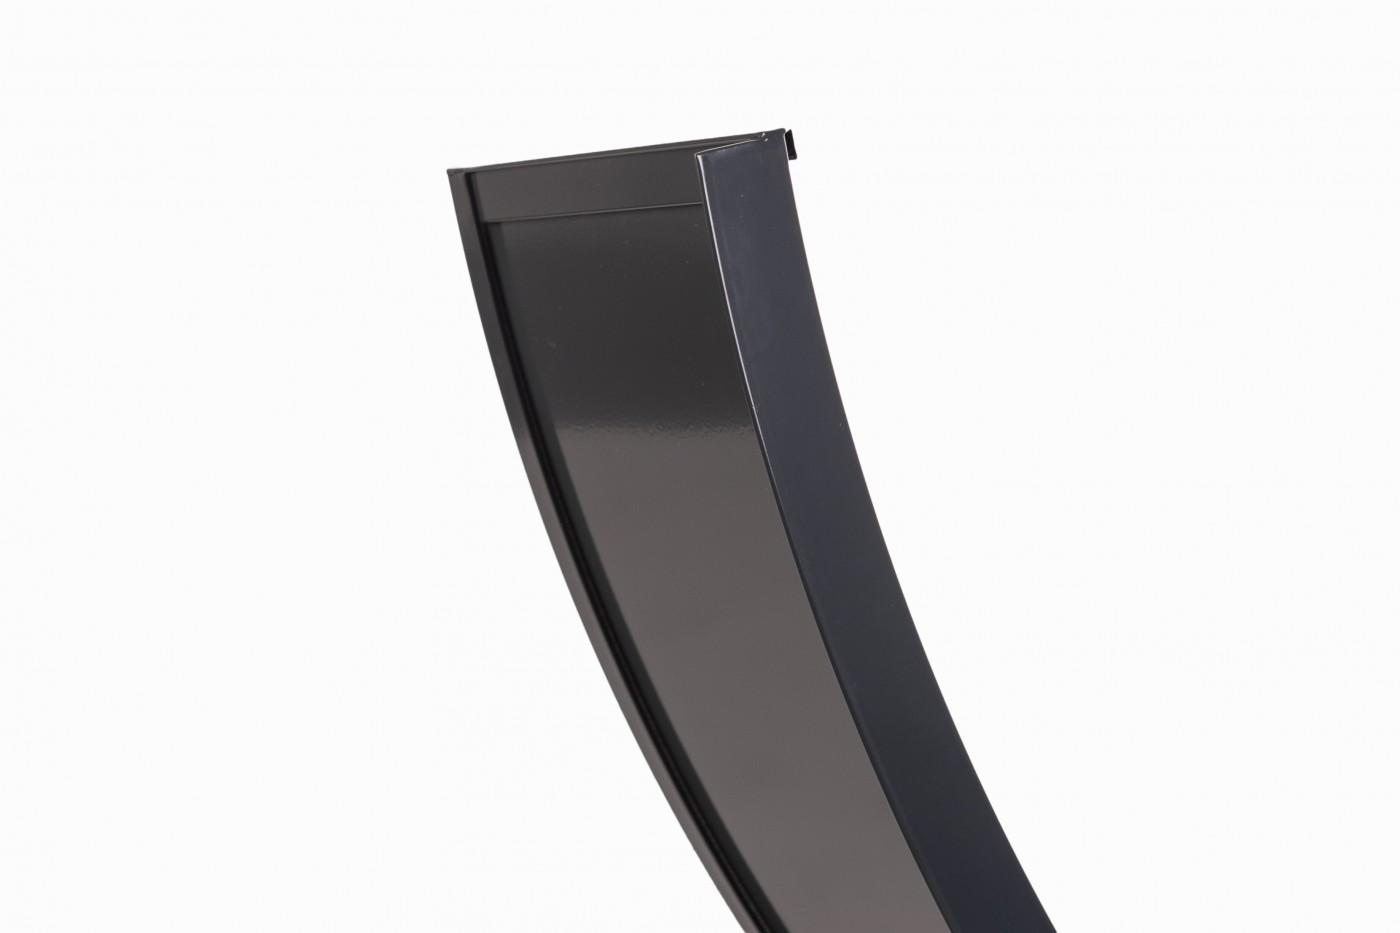 fensterb nke aus aluminium f r rundfenster gesco metall biegetechnik. Black Bedroom Furniture Sets. Home Design Ideas